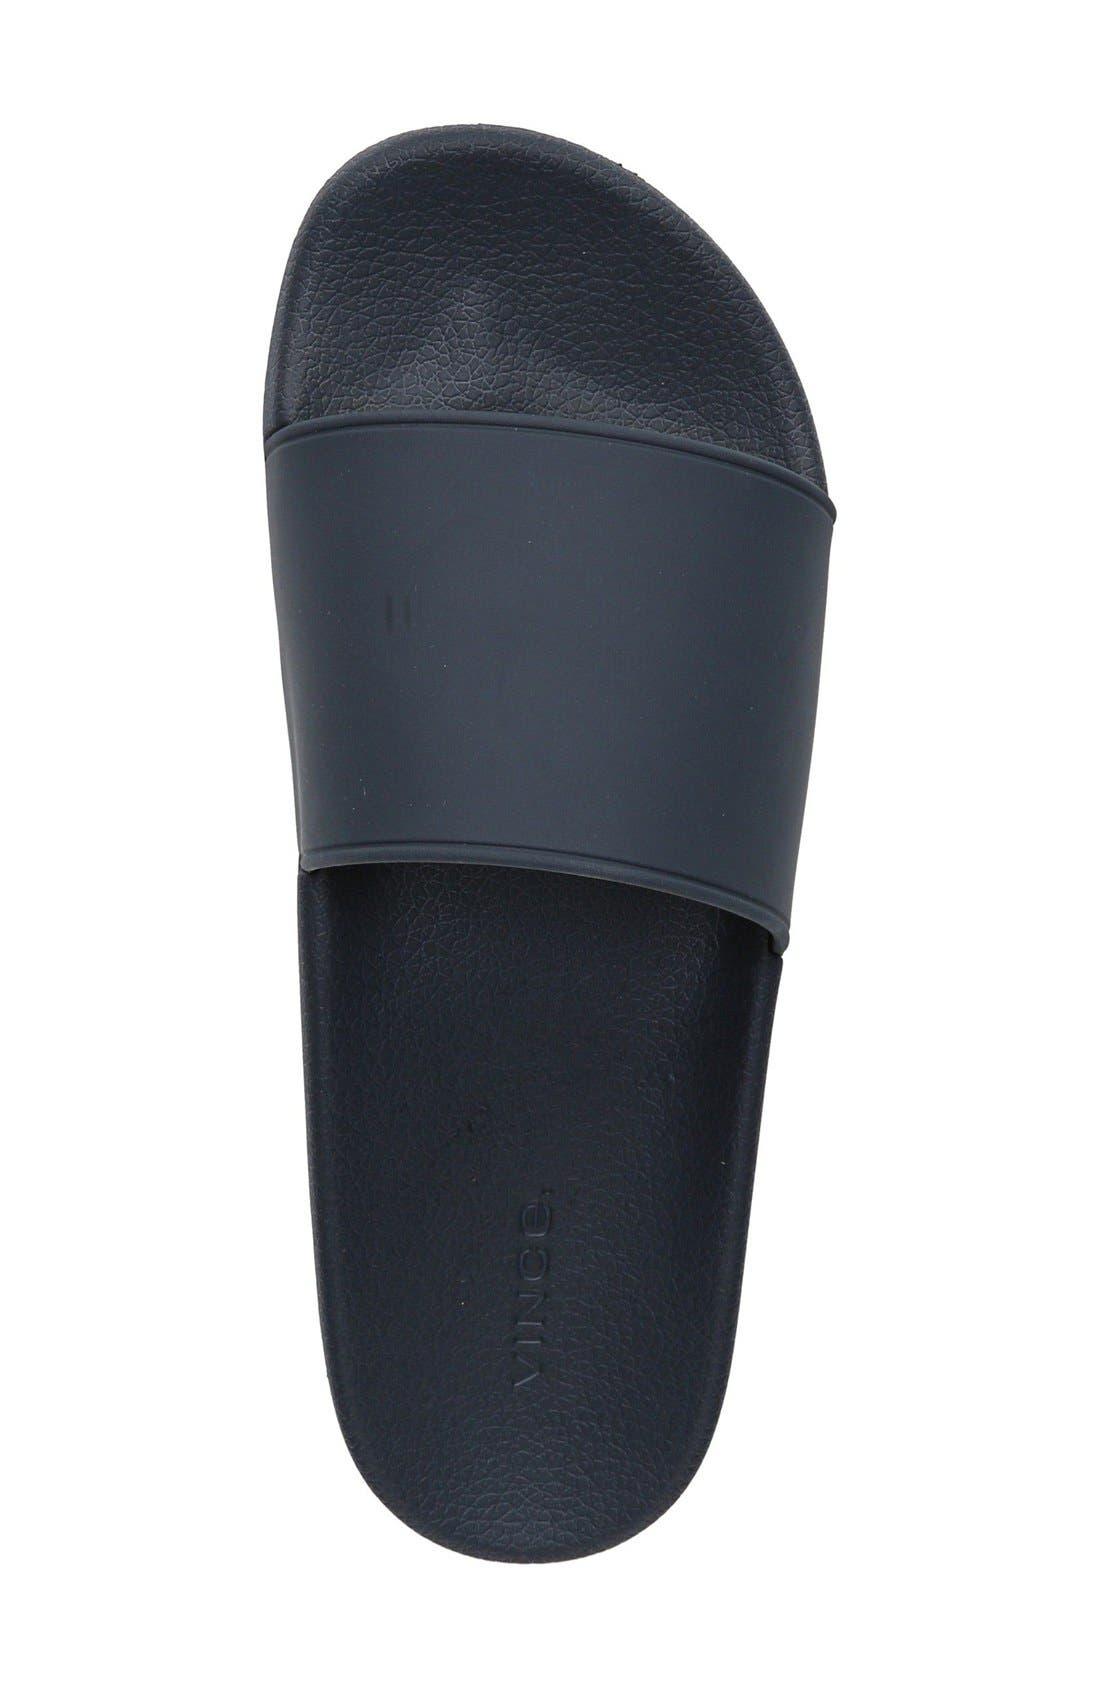 Westcoast Sport Sandal,                             Alternate thumbnail 3, color,                             Coastal Blue